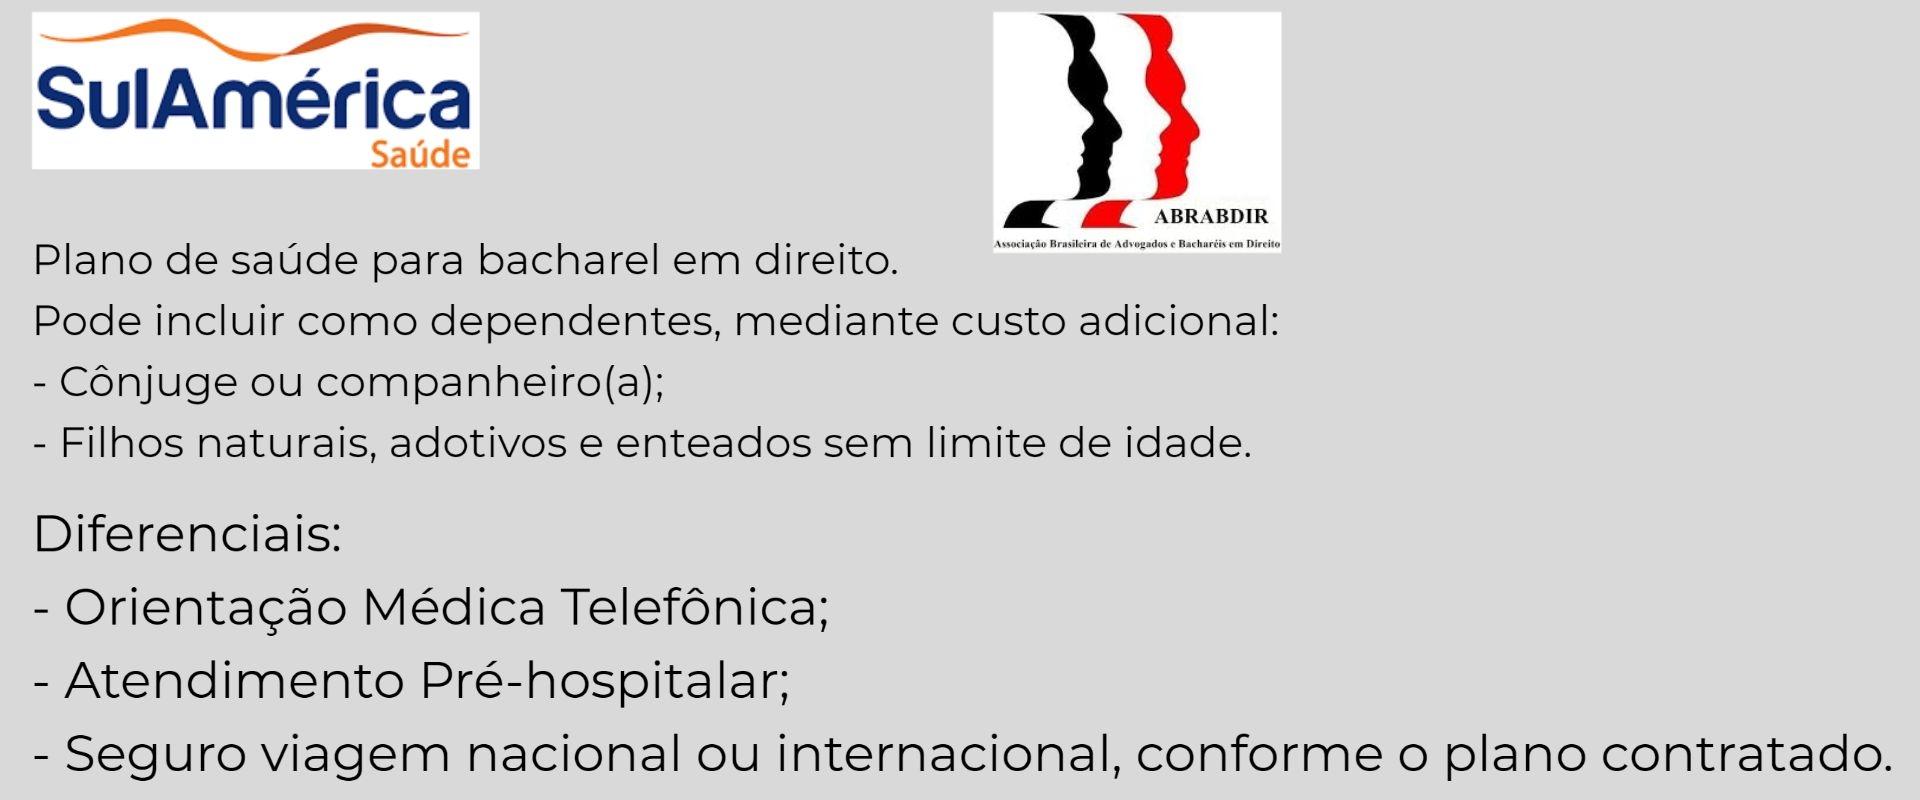 Sul América ABRABDIR-MG